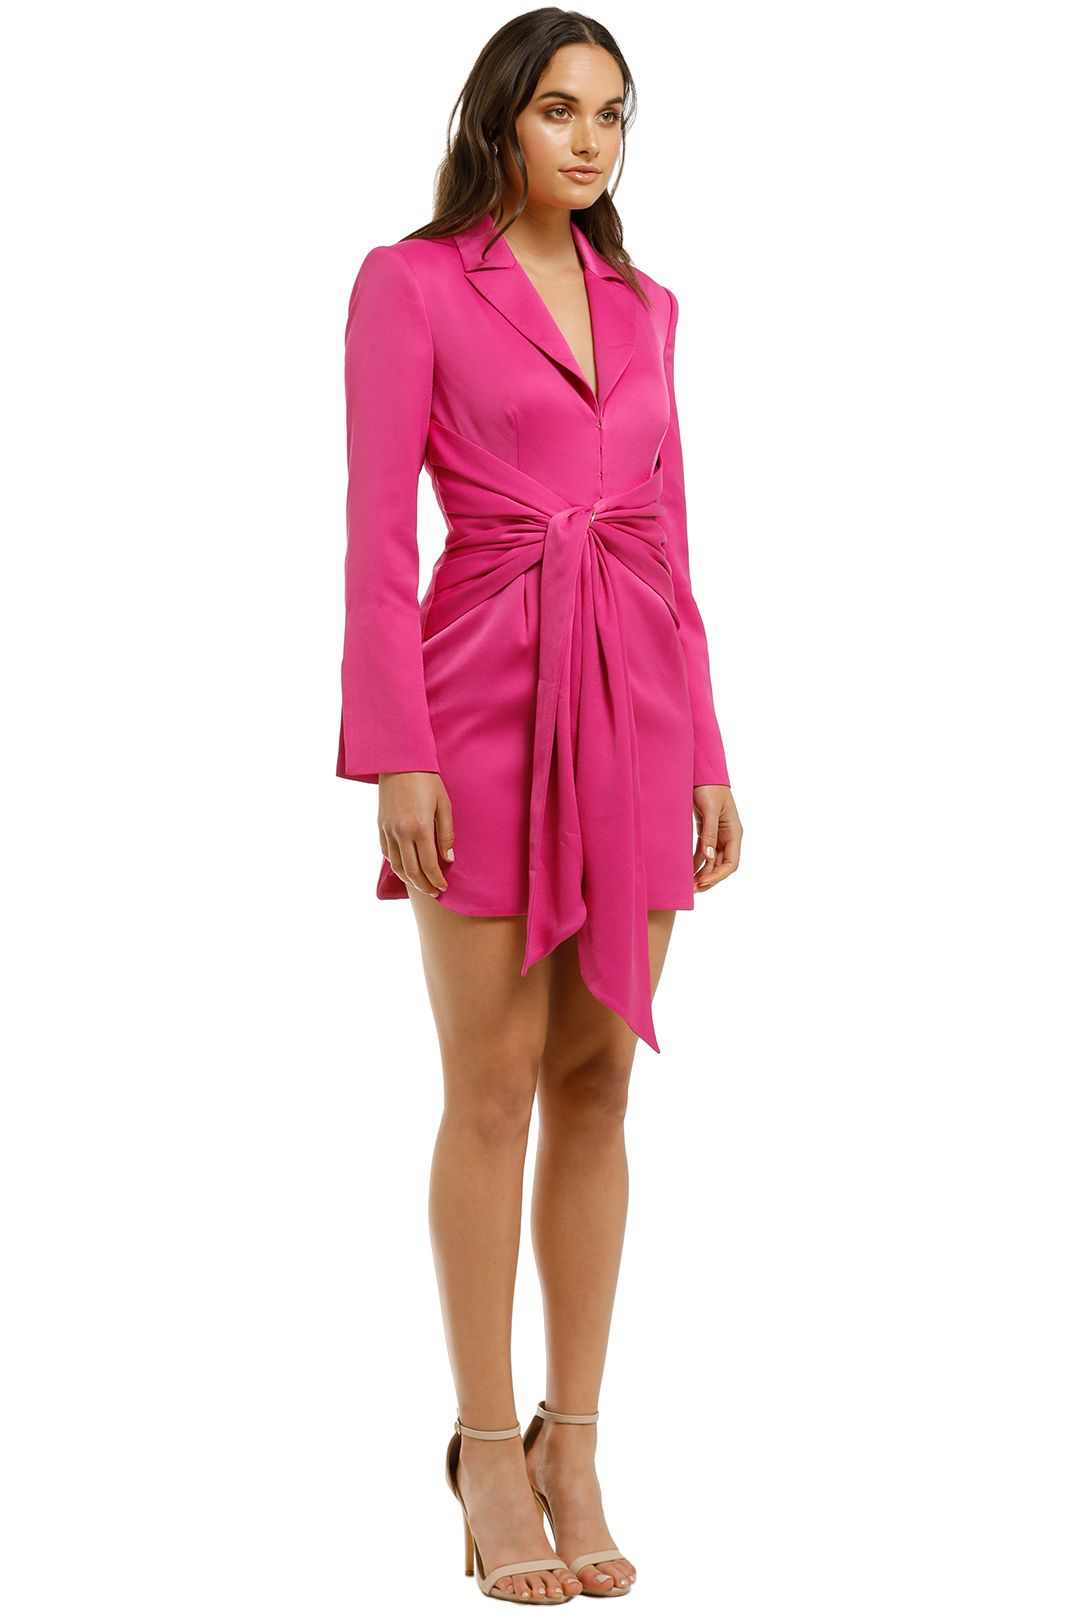 Misha Collection - Teagan Dress - Fuschia - Side